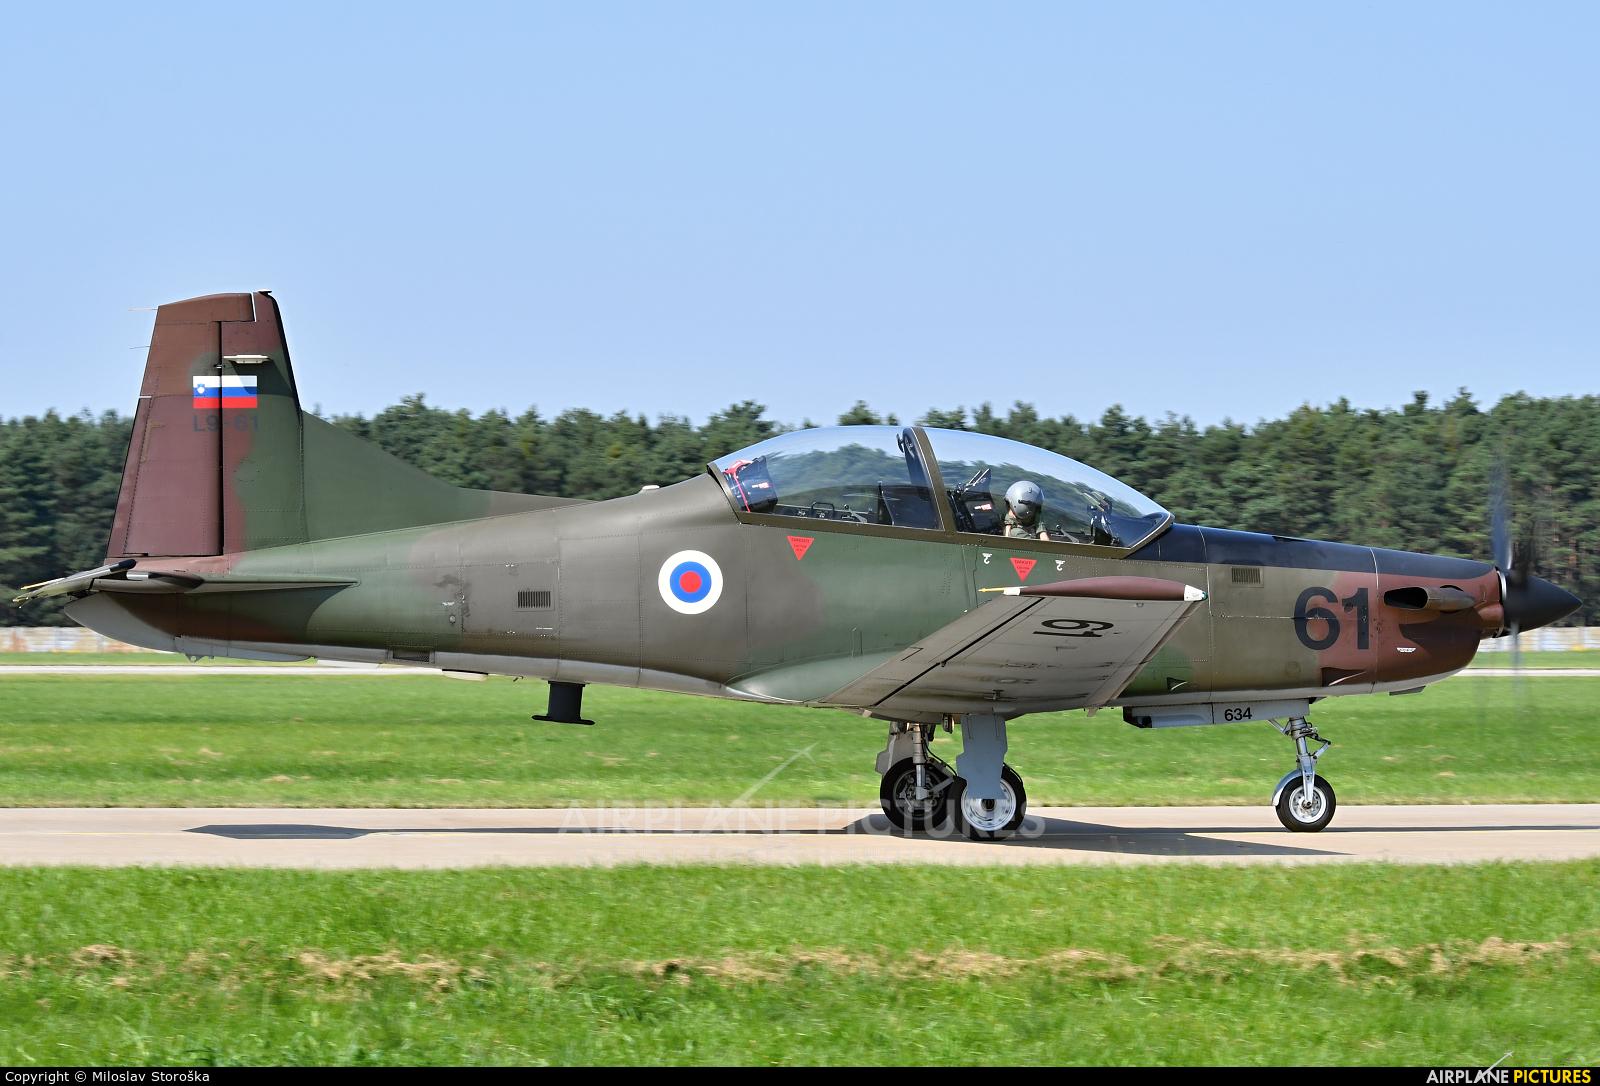 Slovenia - Air Force L9-61 aircraft at Malacky - Kuchyna